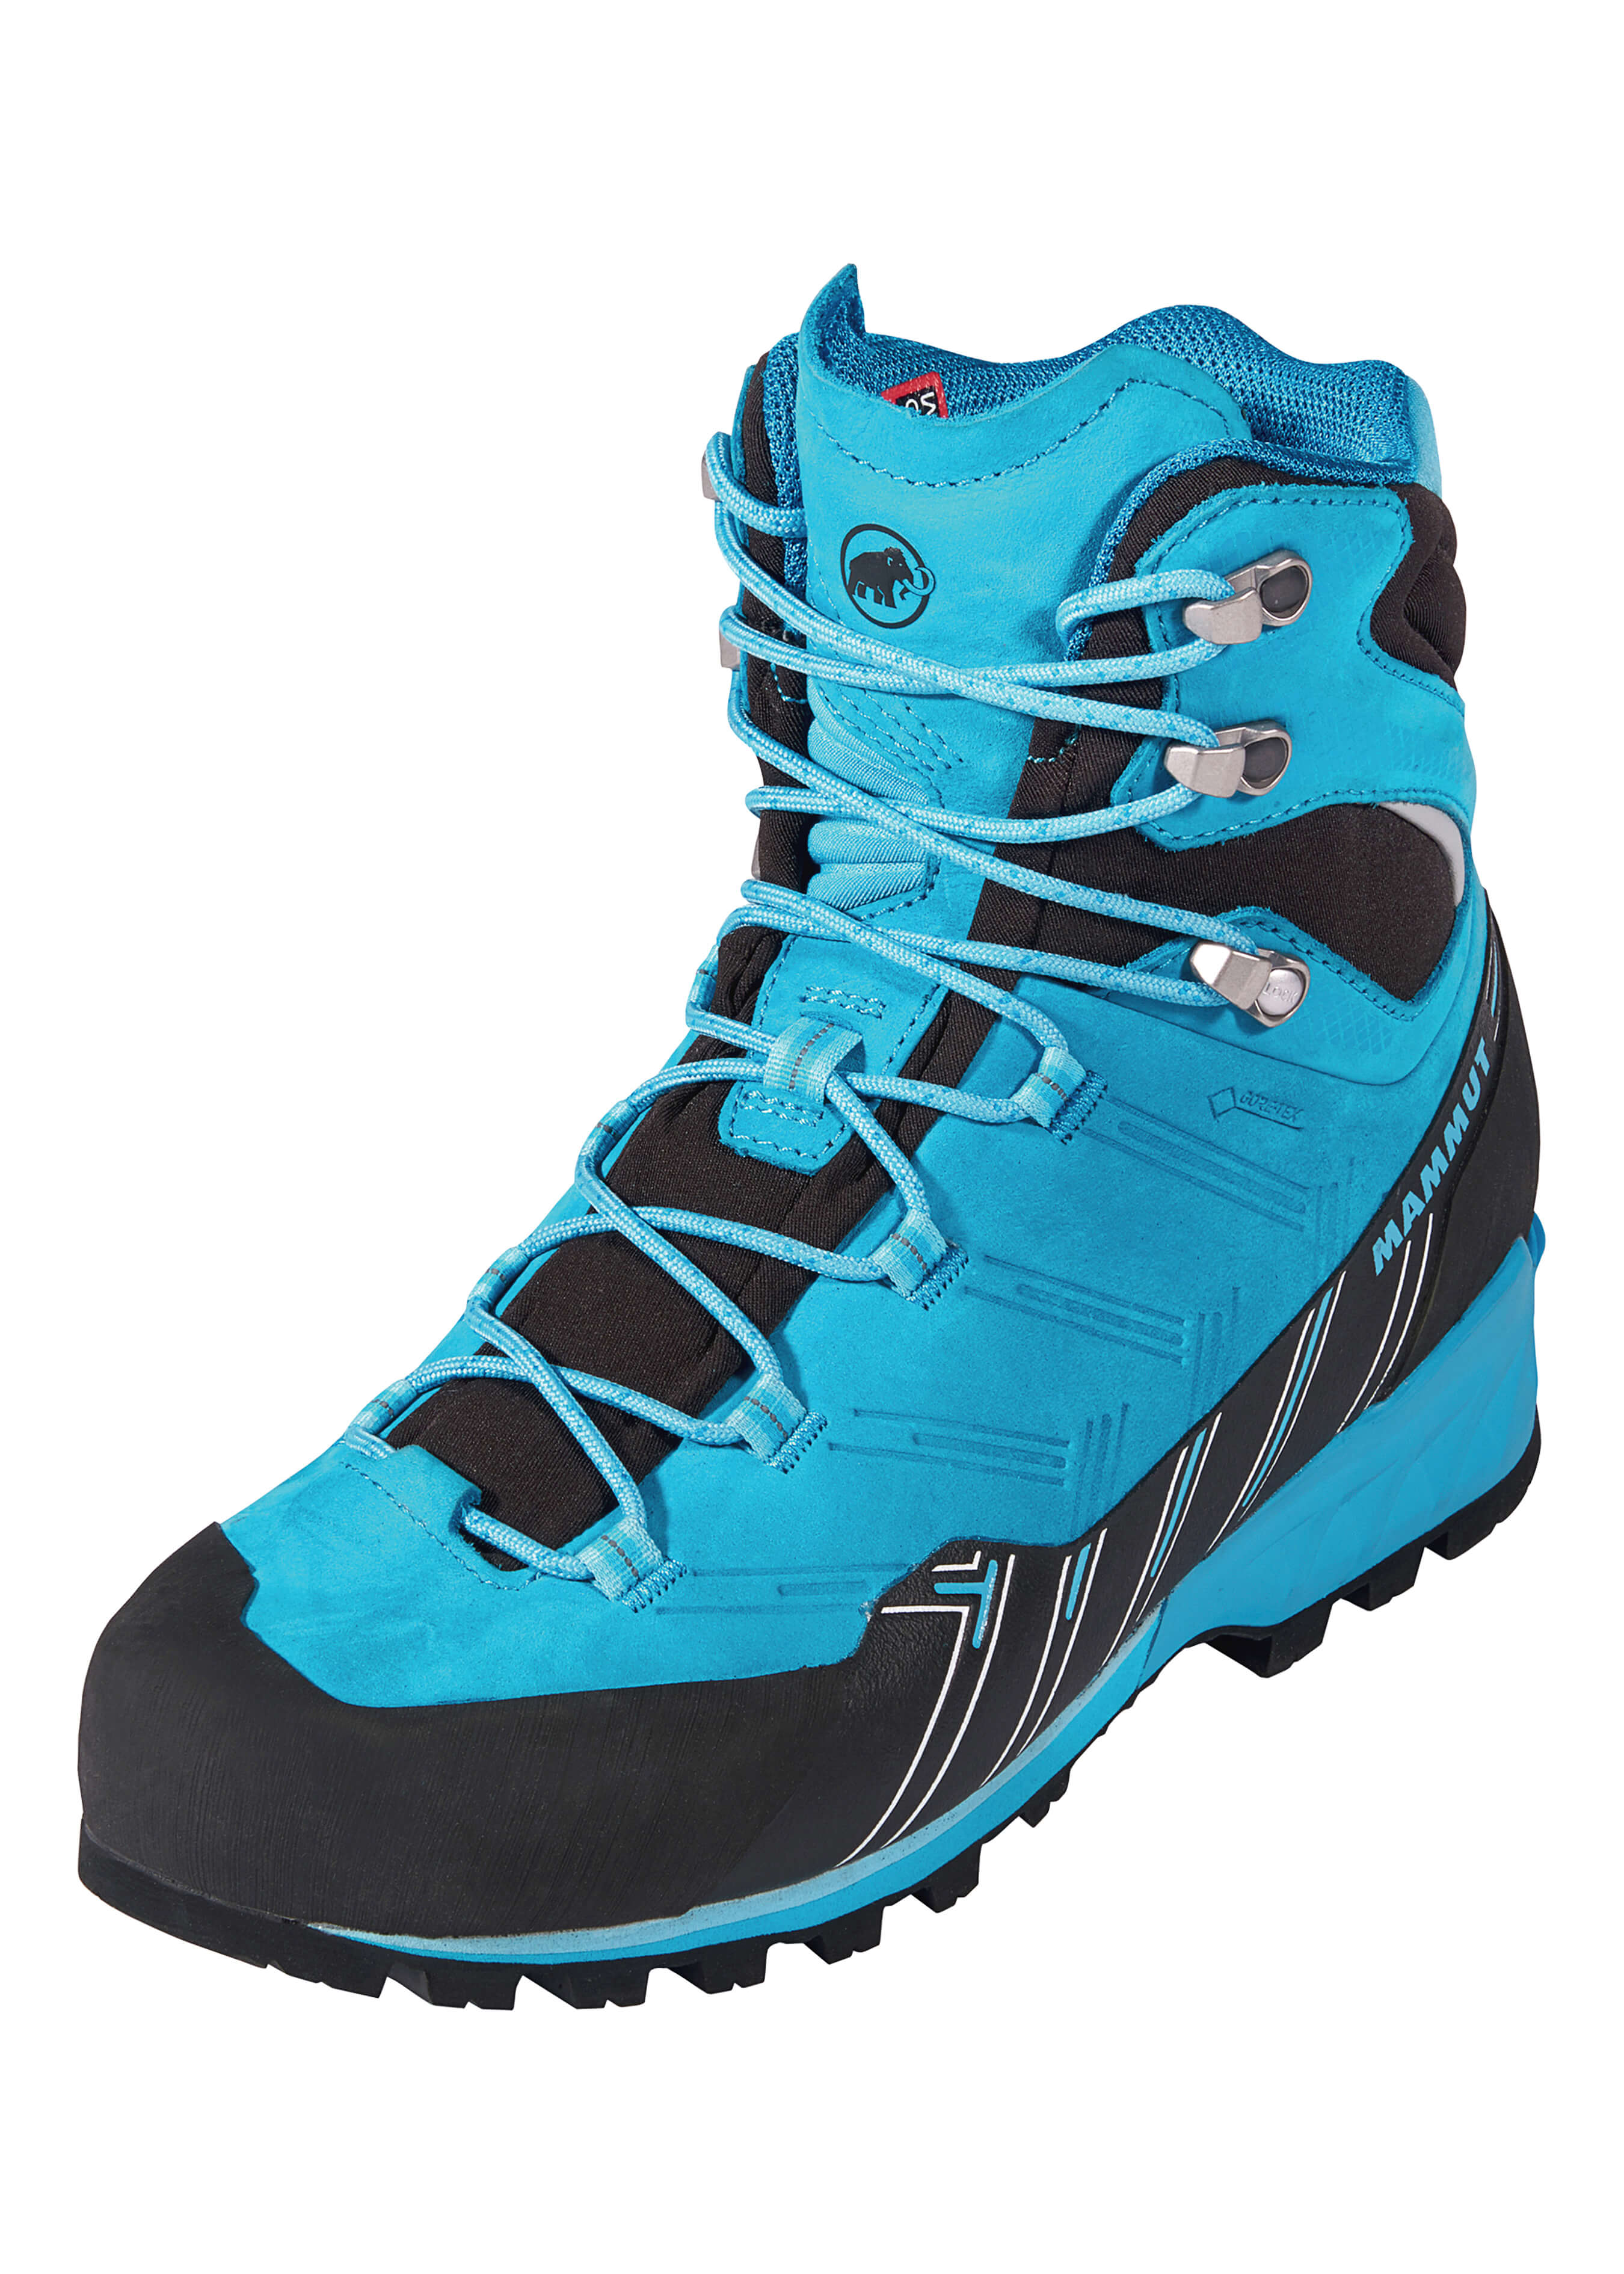 chaussure alpine Kento Guide dames 4202473.5 1